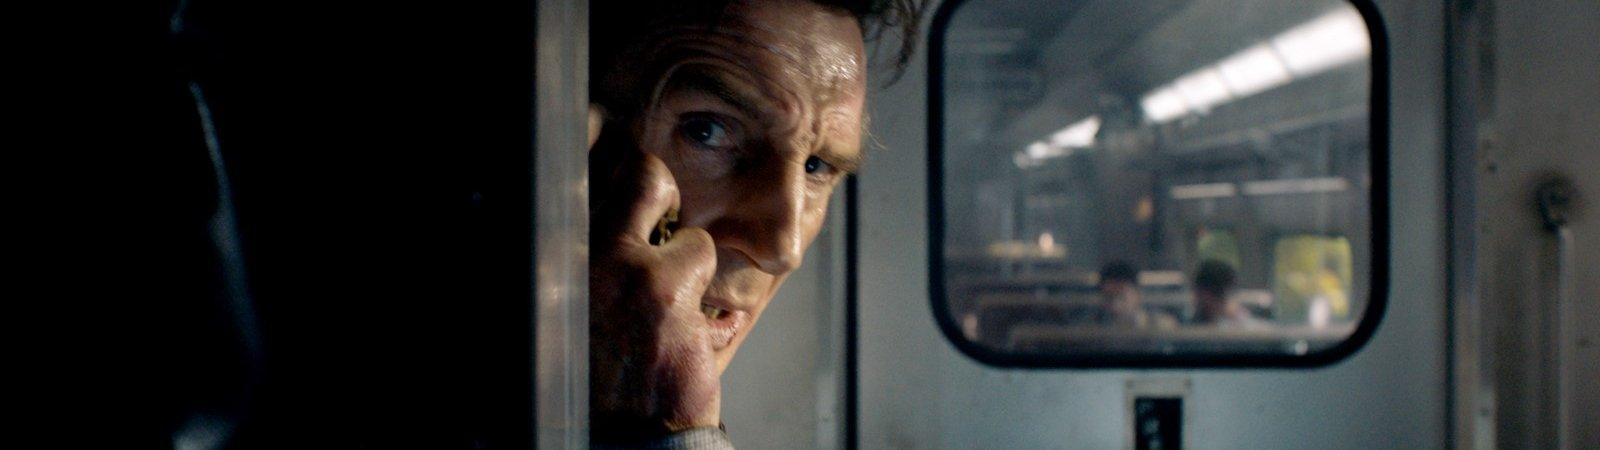 Photo dernier film Liam Neeson